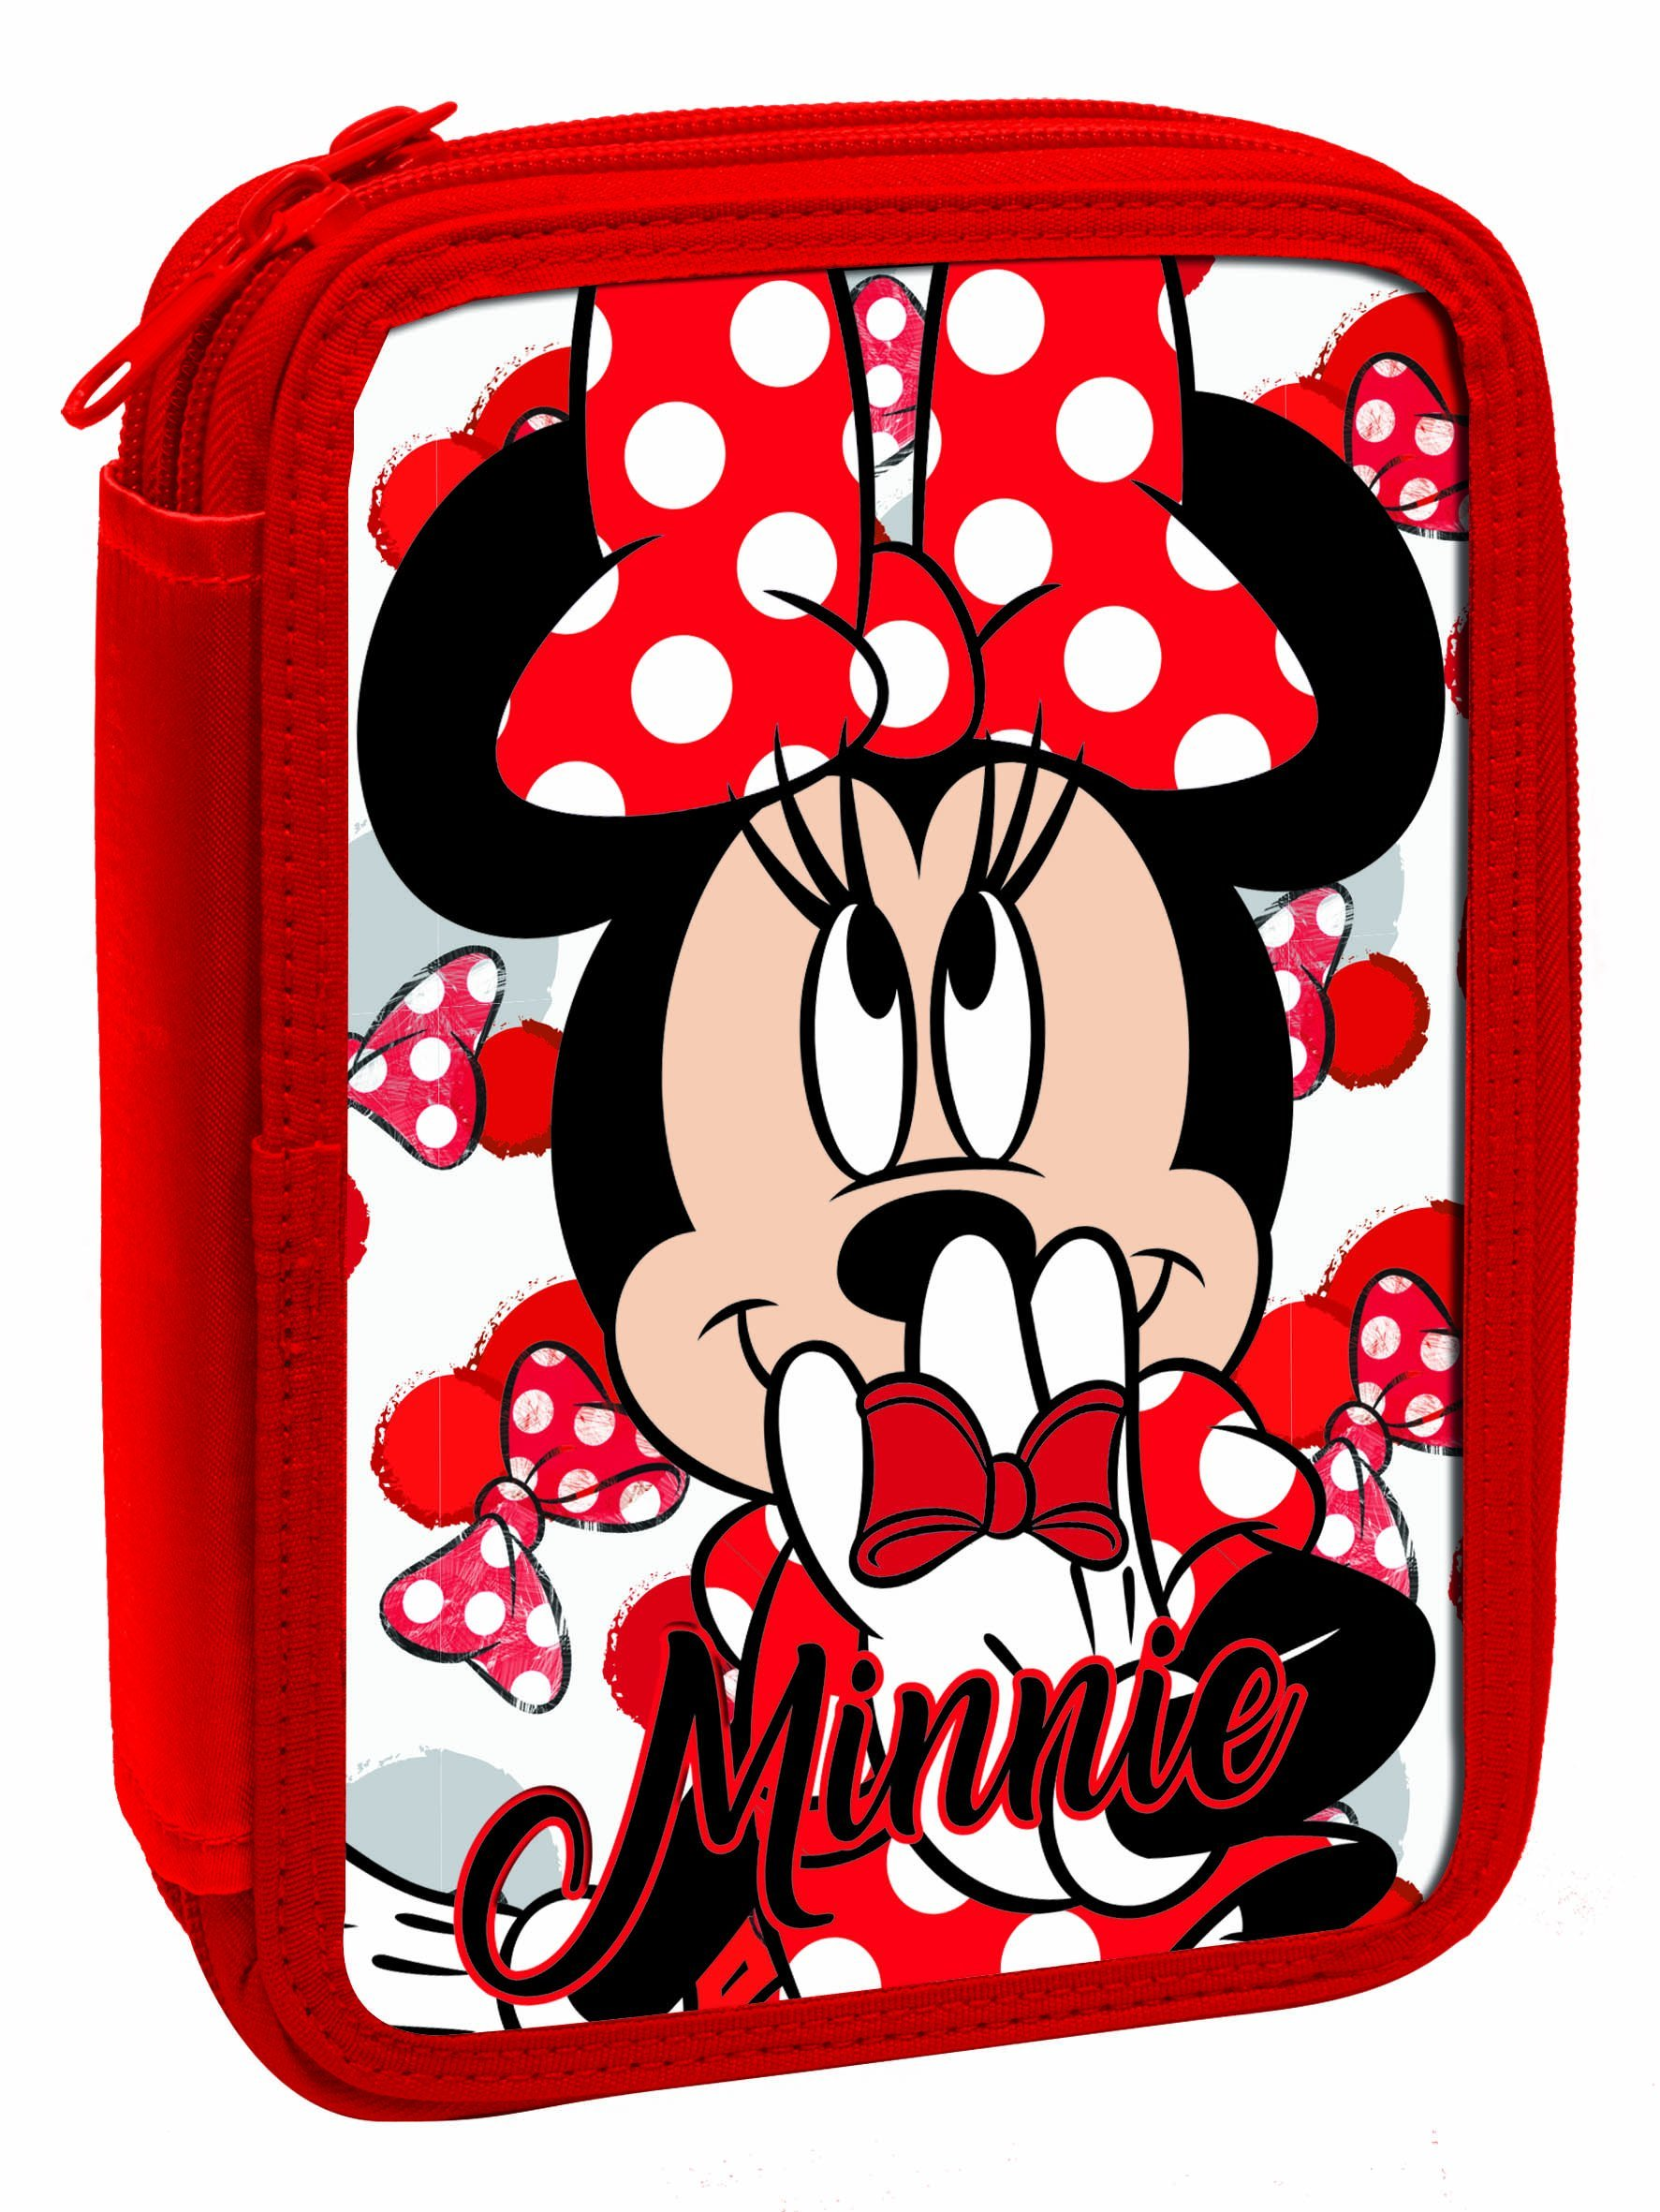 Estuches Multicolor Minnie Mouse